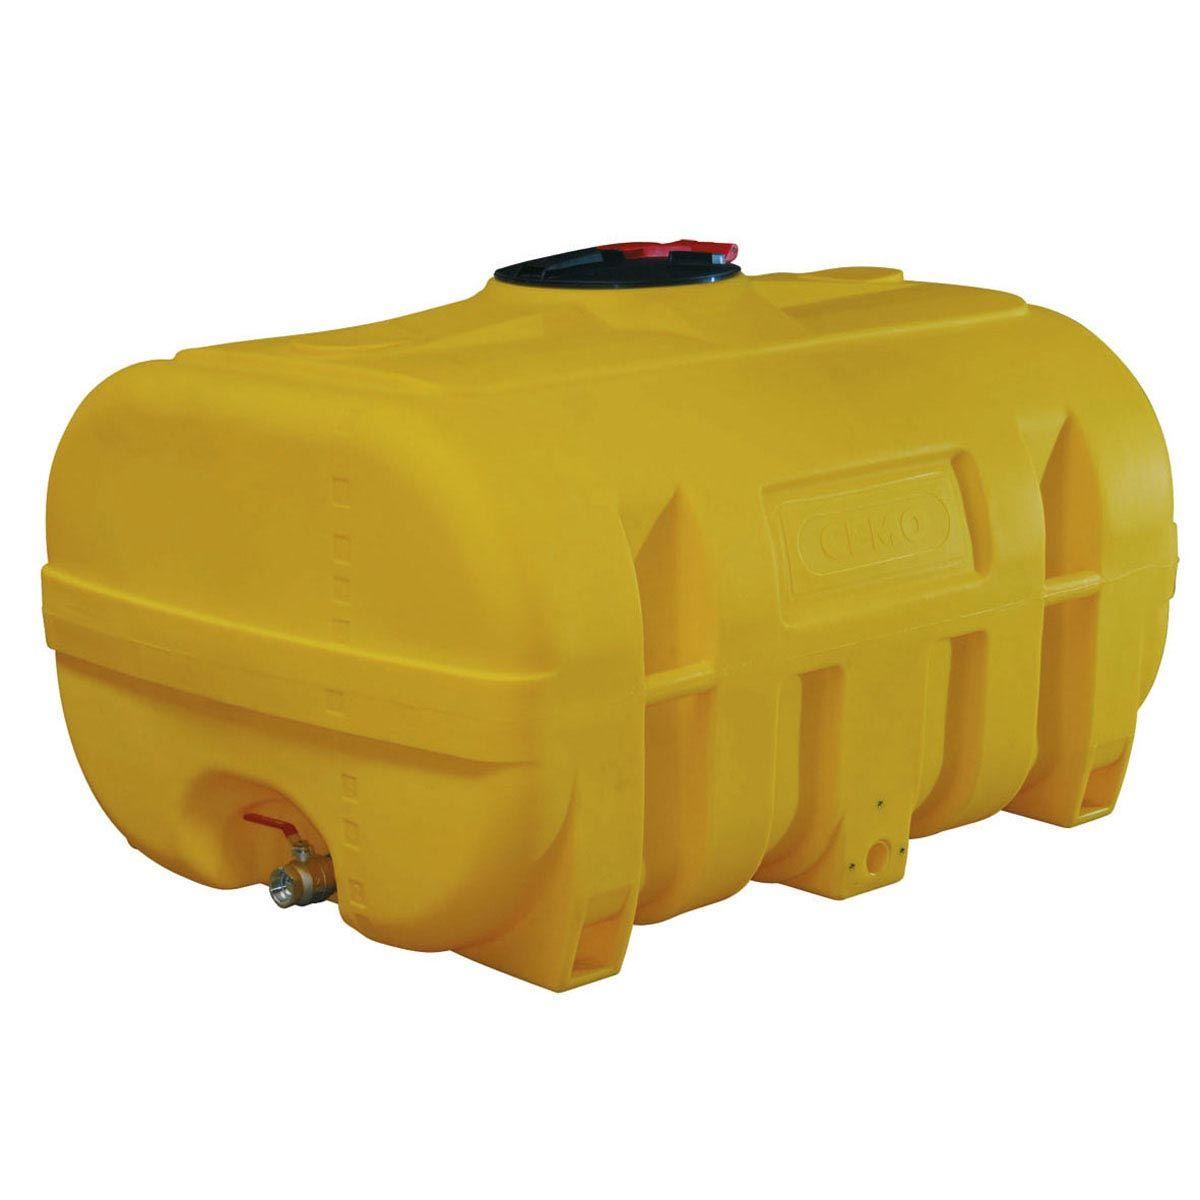 Transportfass, aus PE, gelb eingefärbt, kofferförmig, 600 l, 1200 x 900 x 900 mm